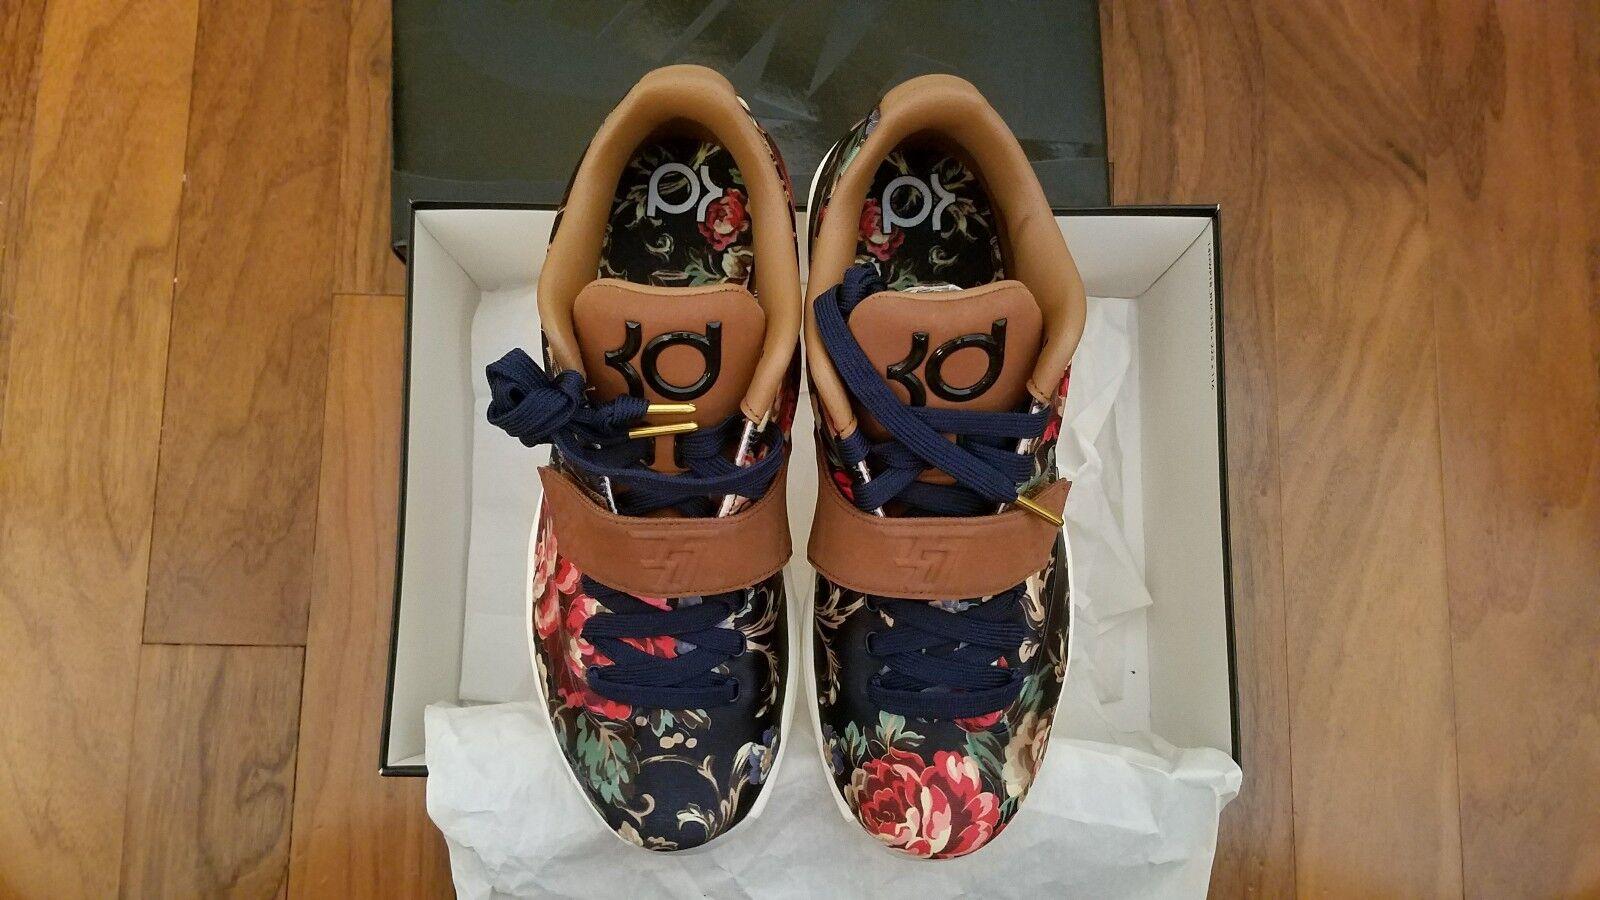 Nike kd 726438-400 vii 7 ext floral - 726438-400 kd größe 7,5 versandkostenfrei! 5035af